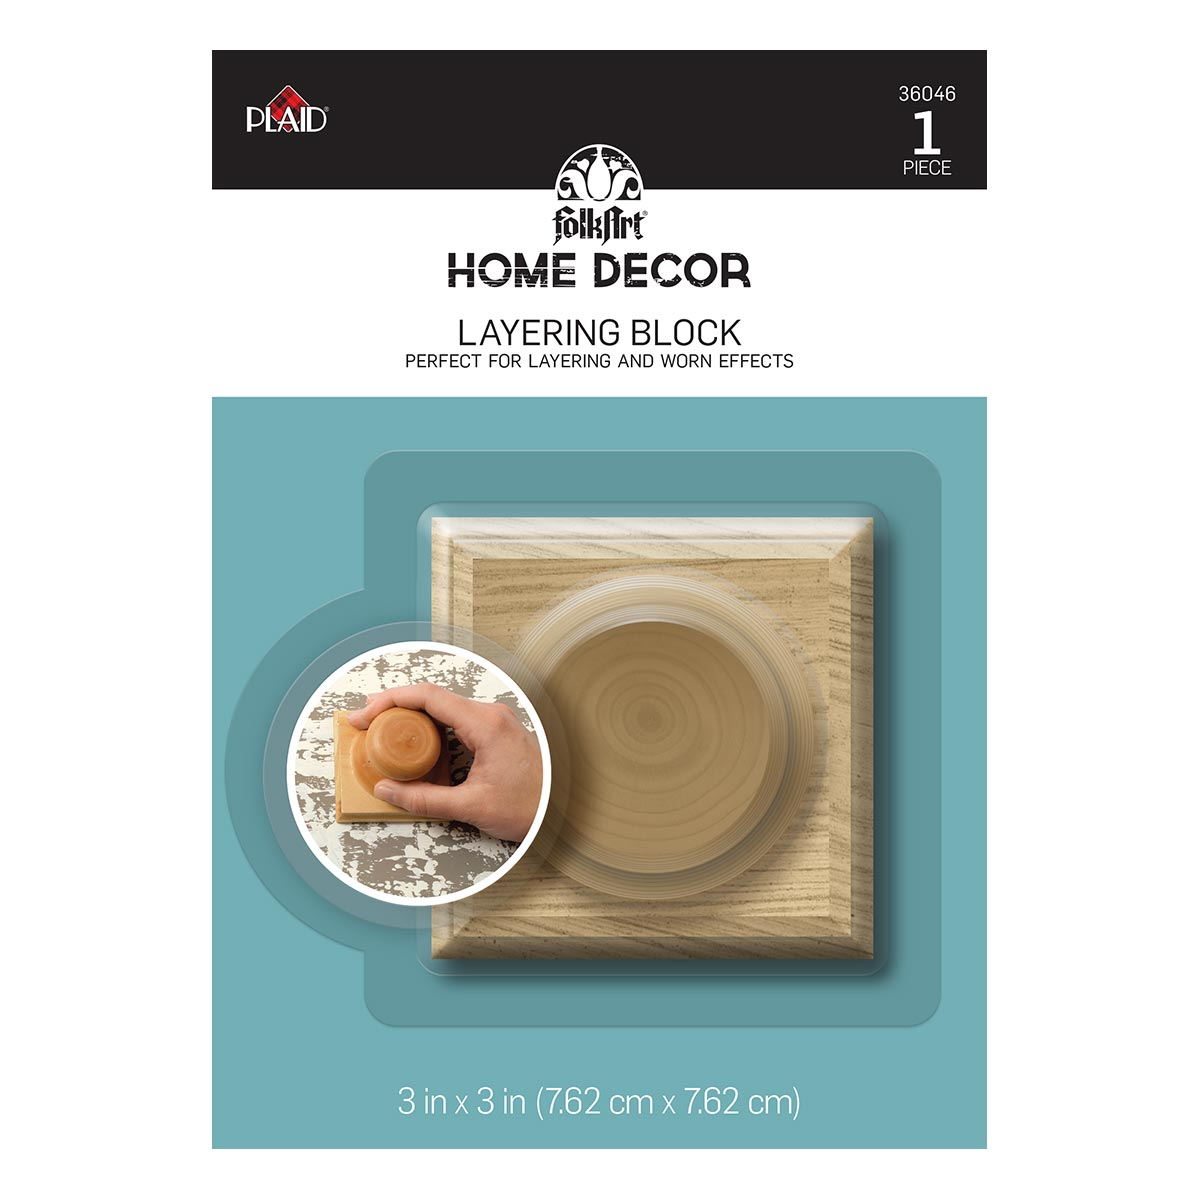 FolkArt ® Home Decor™ Tools - Layering Block - 36046